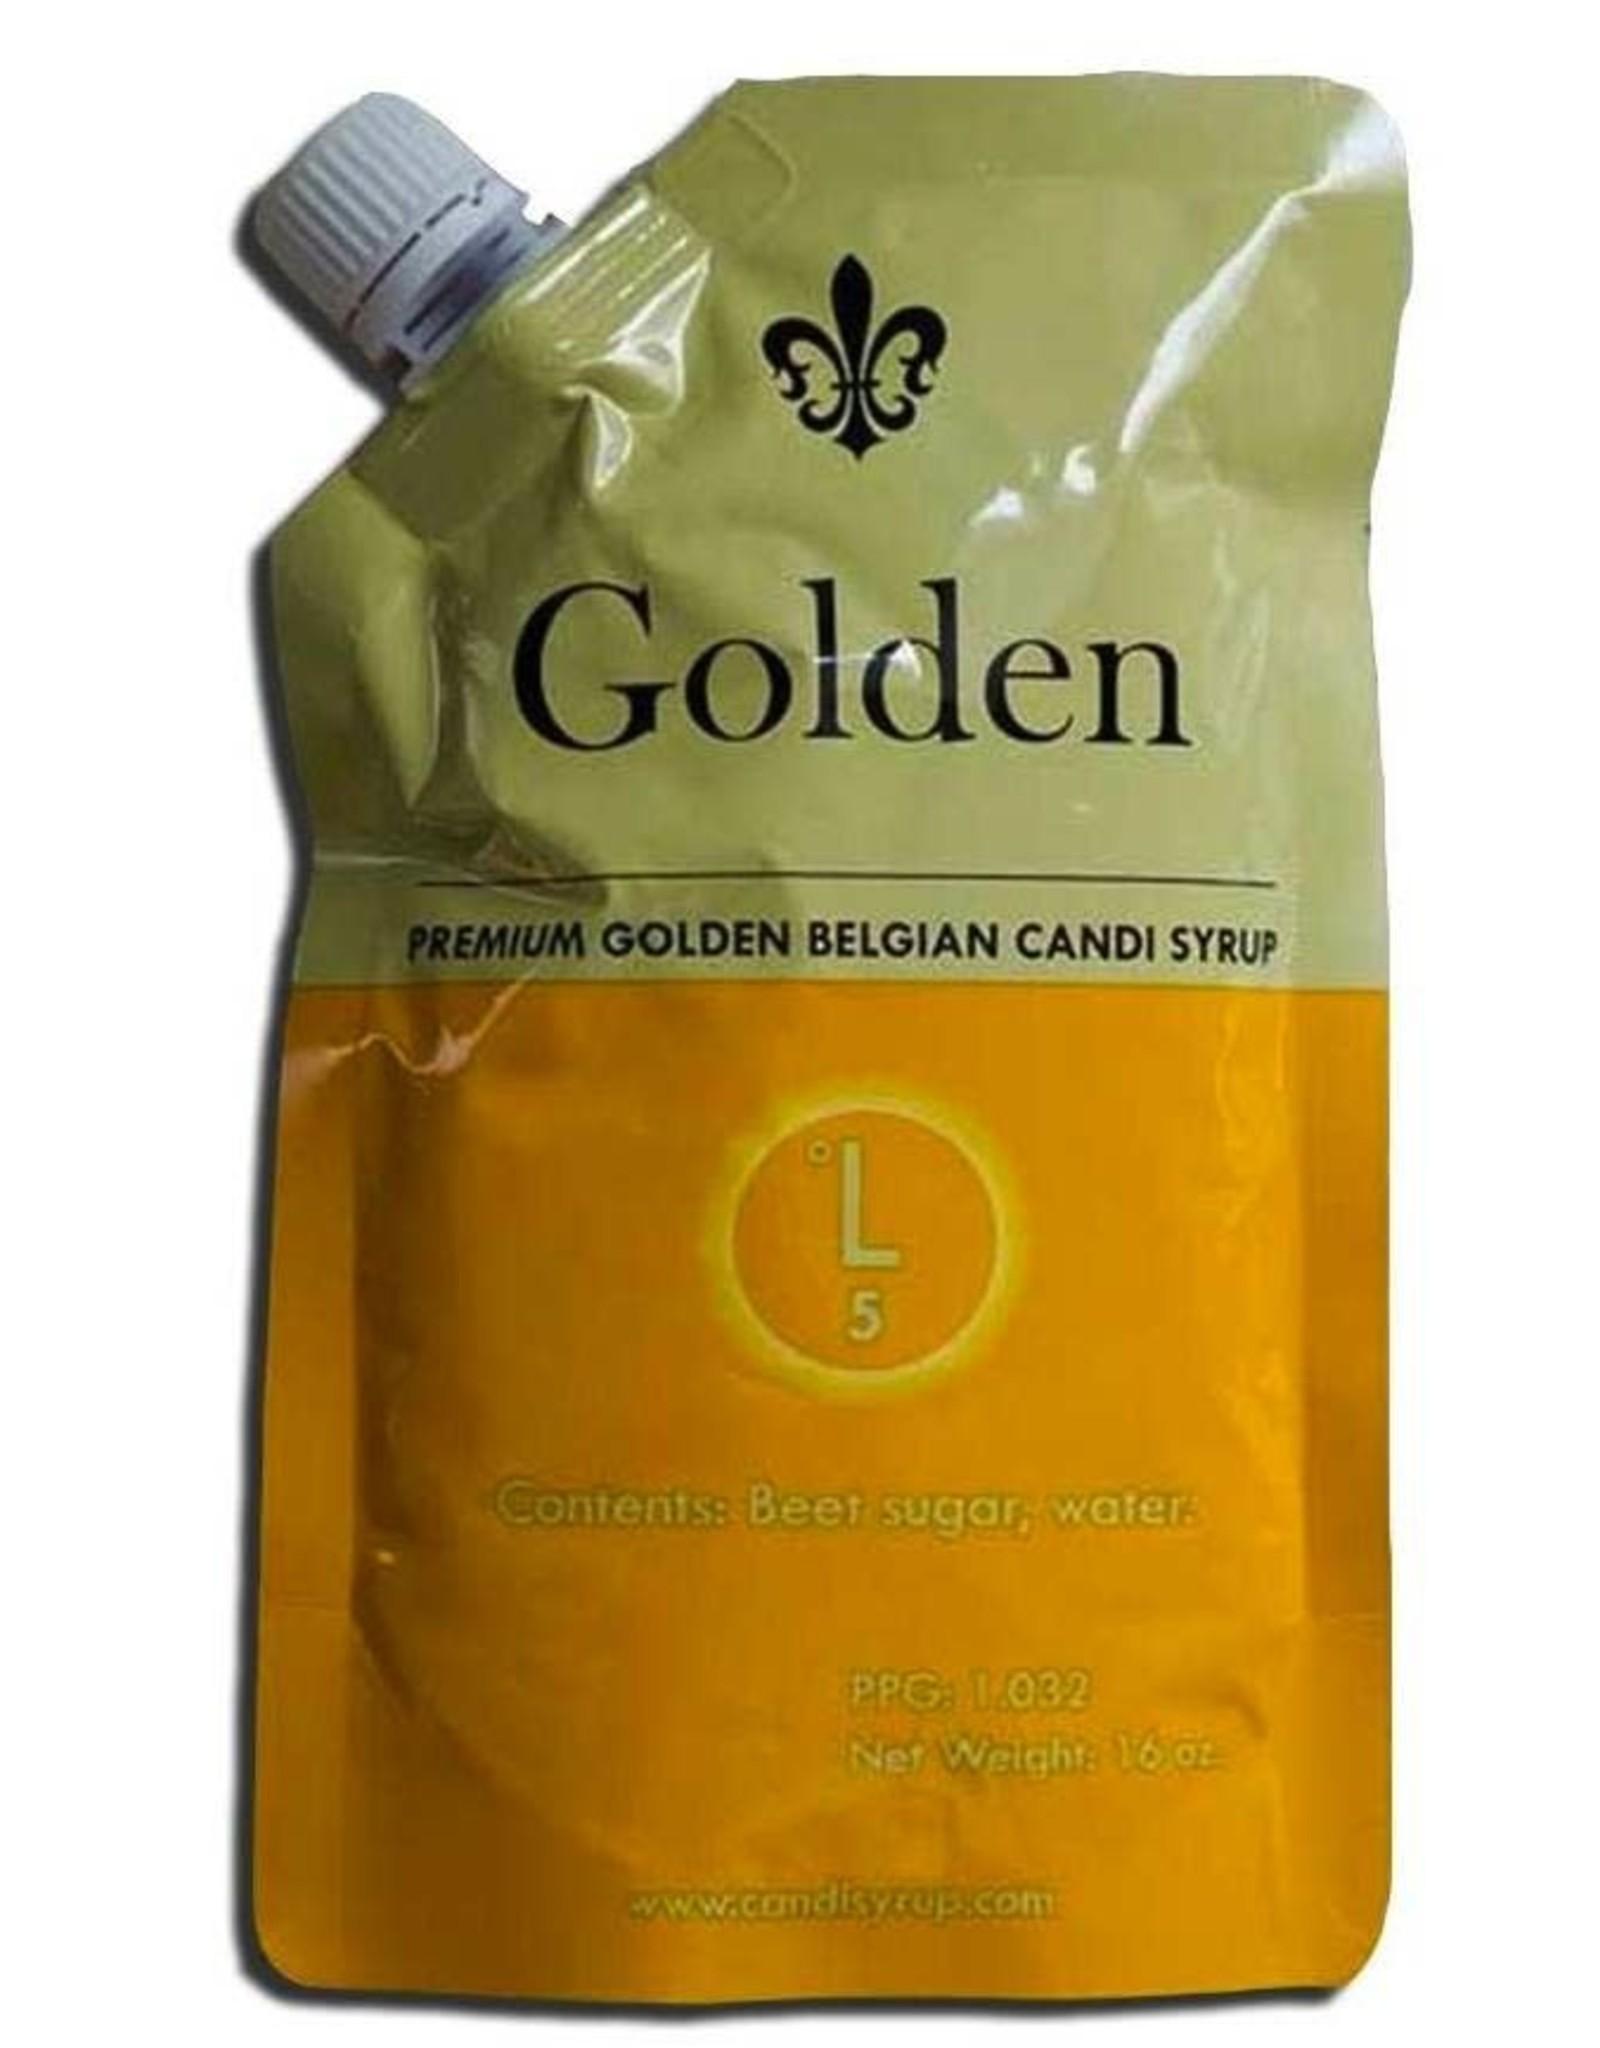 Candi Syrup - Golden 5 Lovibond 1 lb